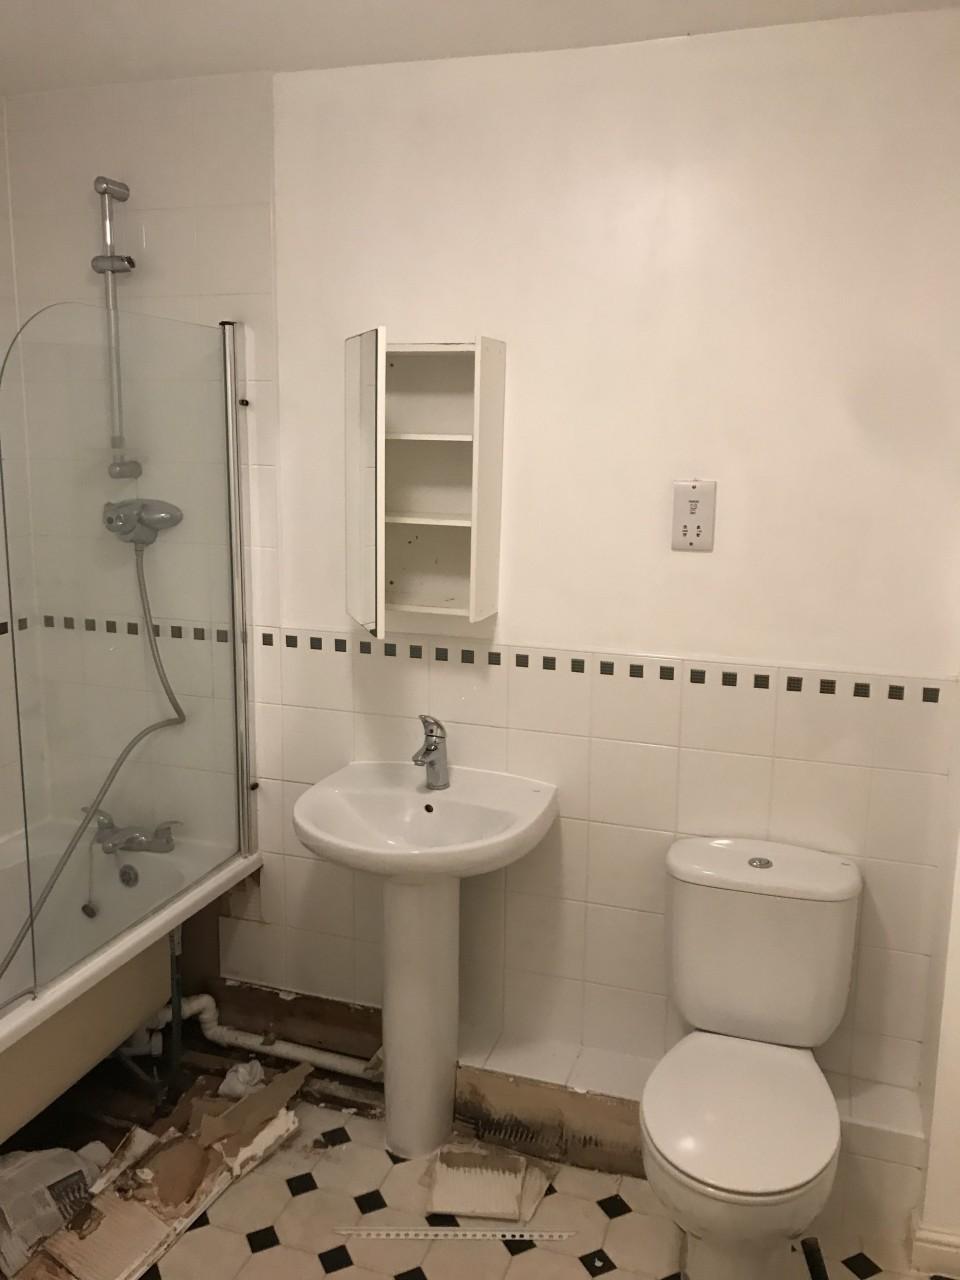 From light to dark. A delightful bathroom transformation - Marchbank ...